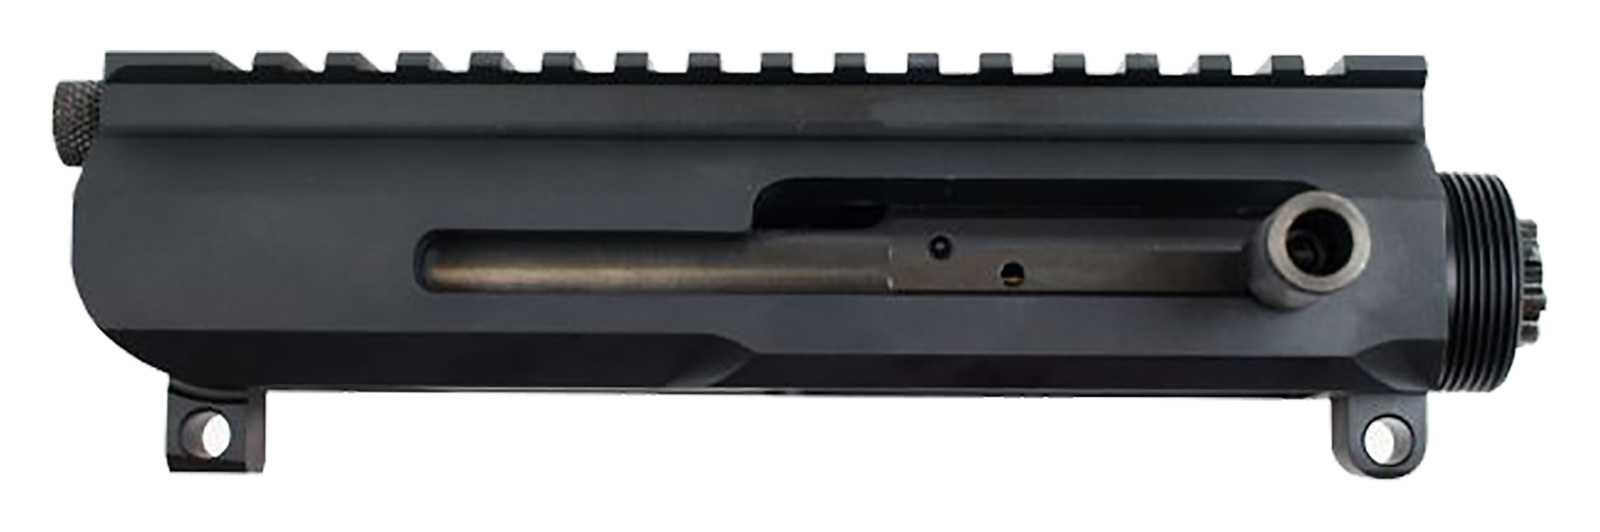 ar15-side-charging-upper-receiver-190060